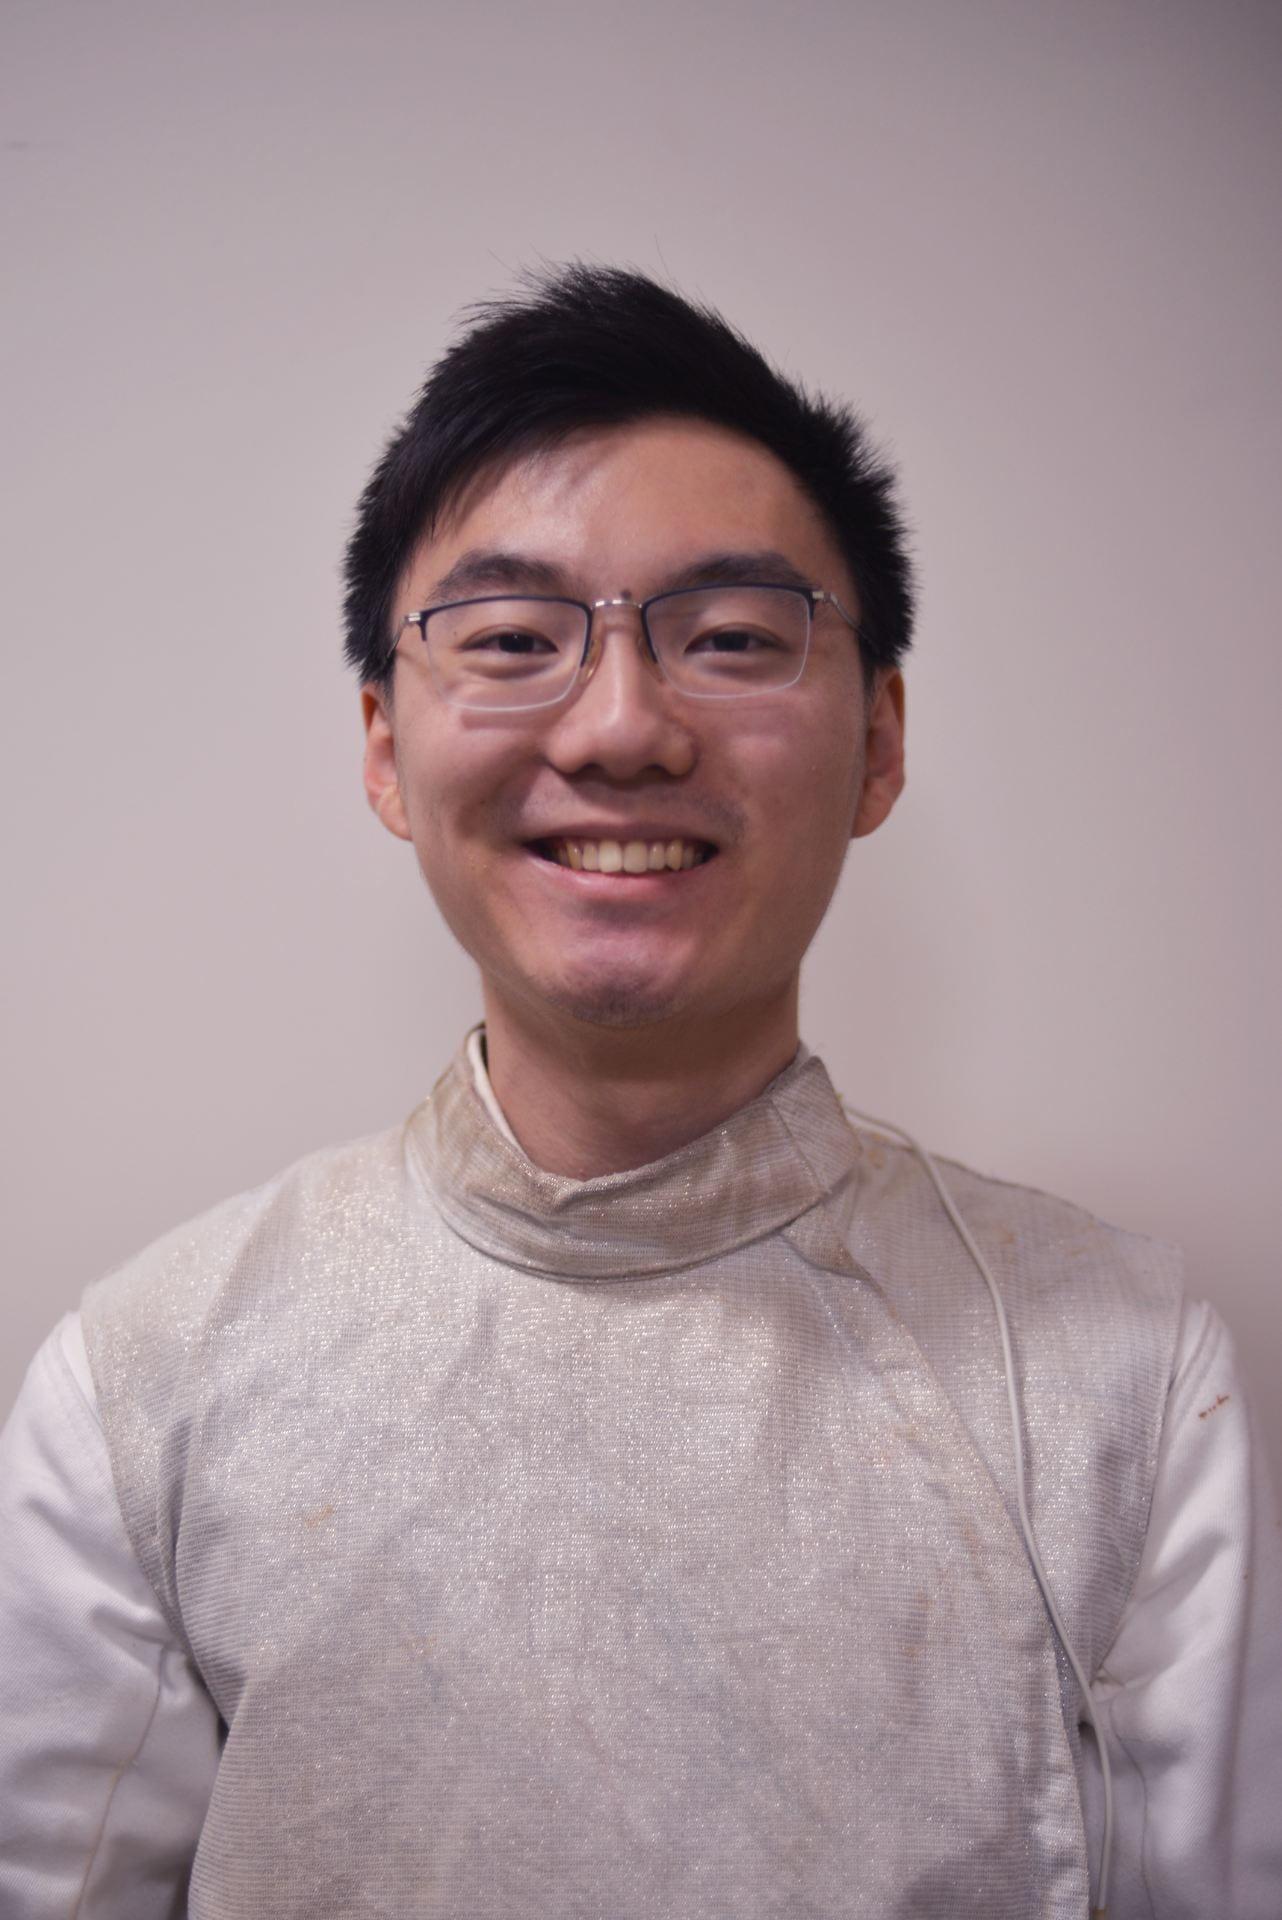 Raymond Hsu